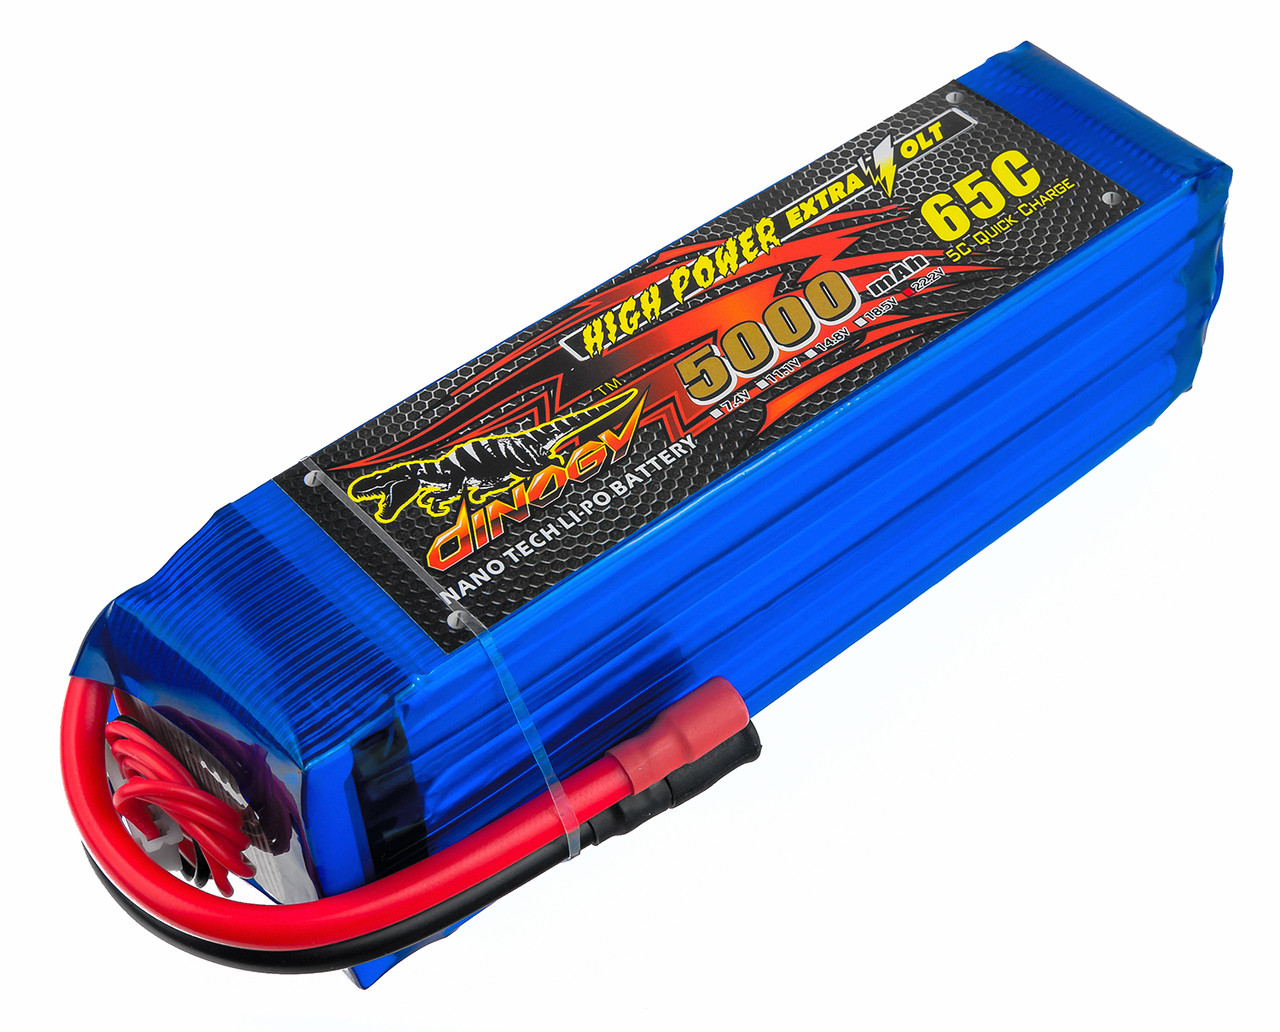 Аккумулятор Dinogy Li-Pol 5000mAh 22.2V 6S 65C 51x46x165мм Bullet 6mm